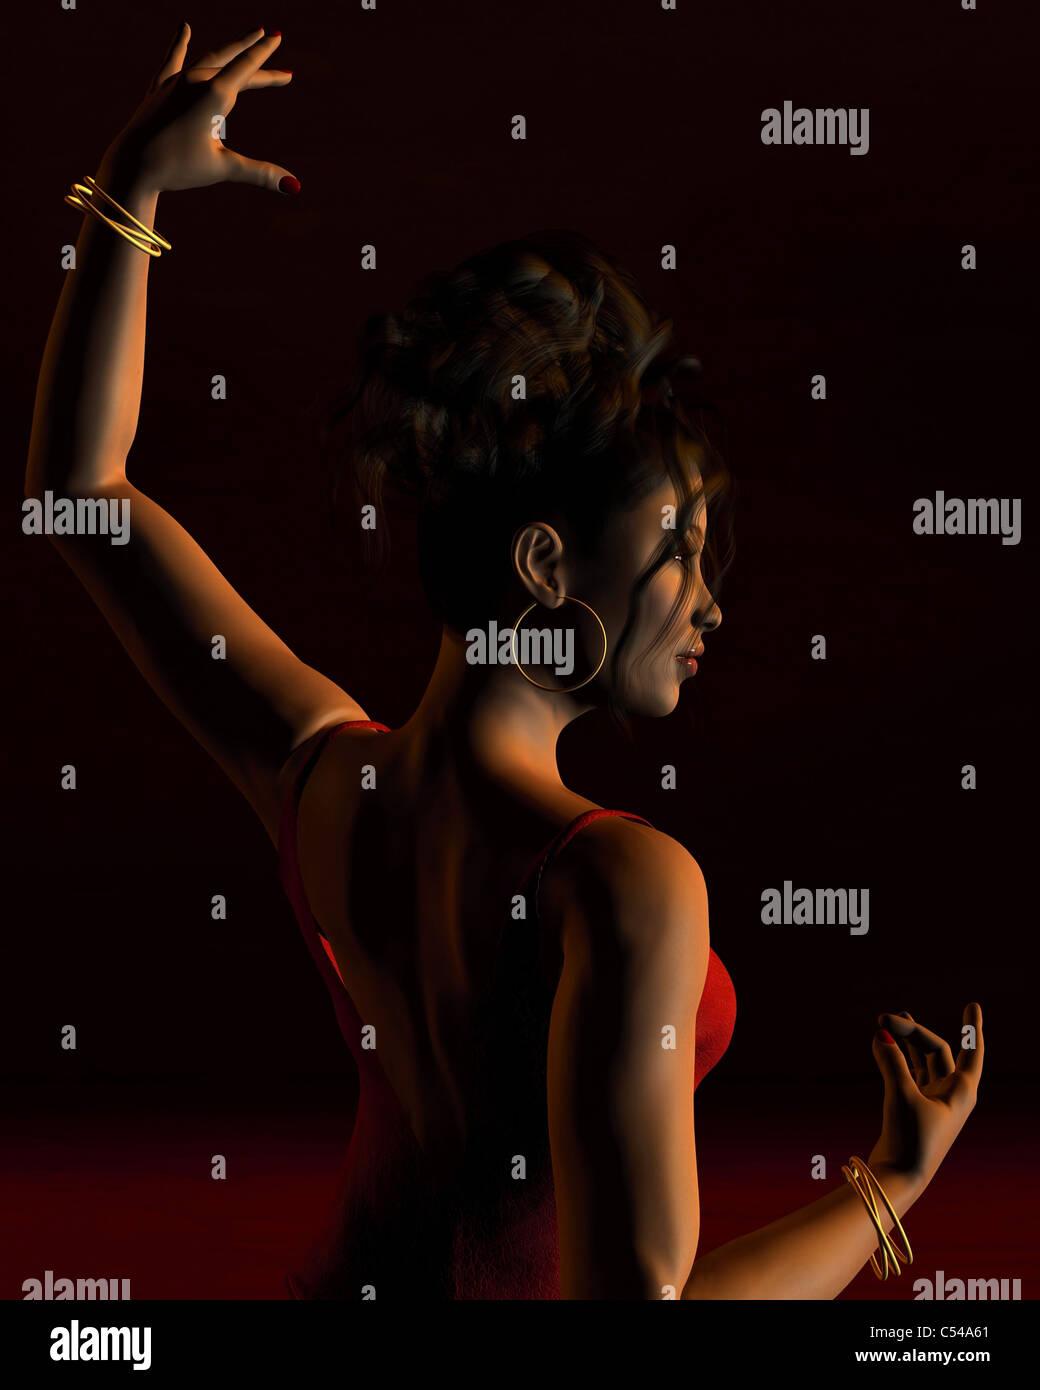 Spanish Flamenco Dancer on a dark stage - 1 - Stock Image